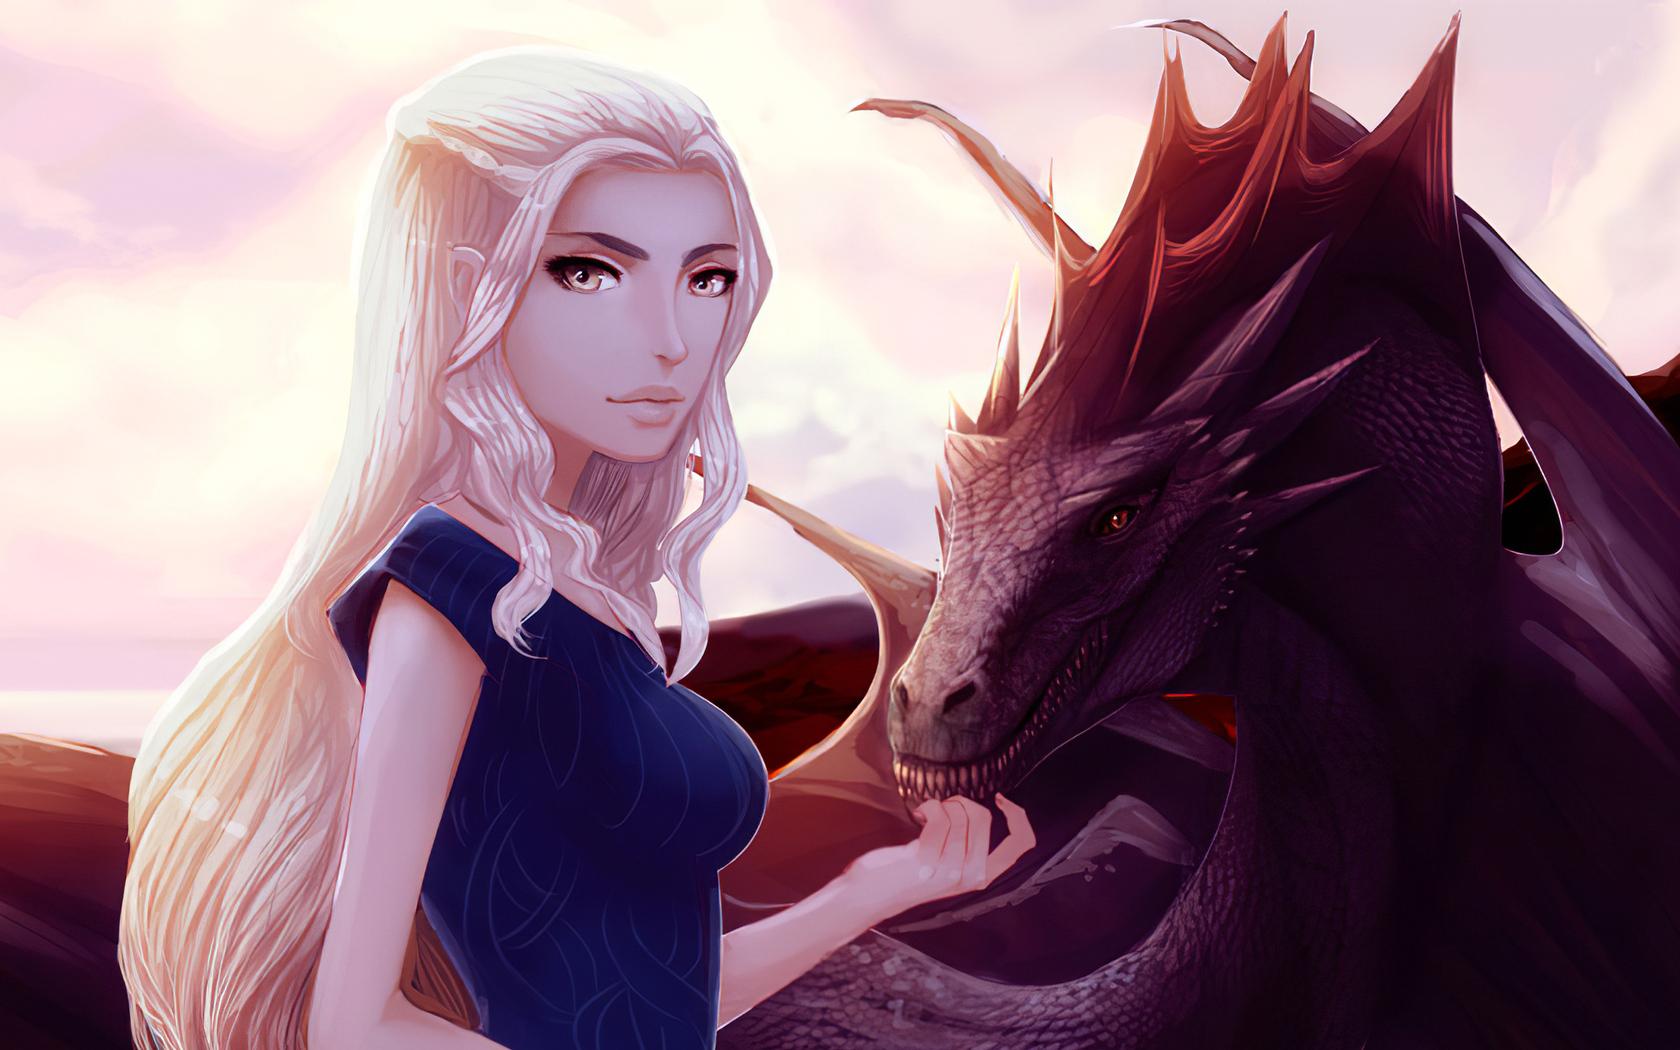 daenerys-targaryen-petting-his-dragon-m7.jpg